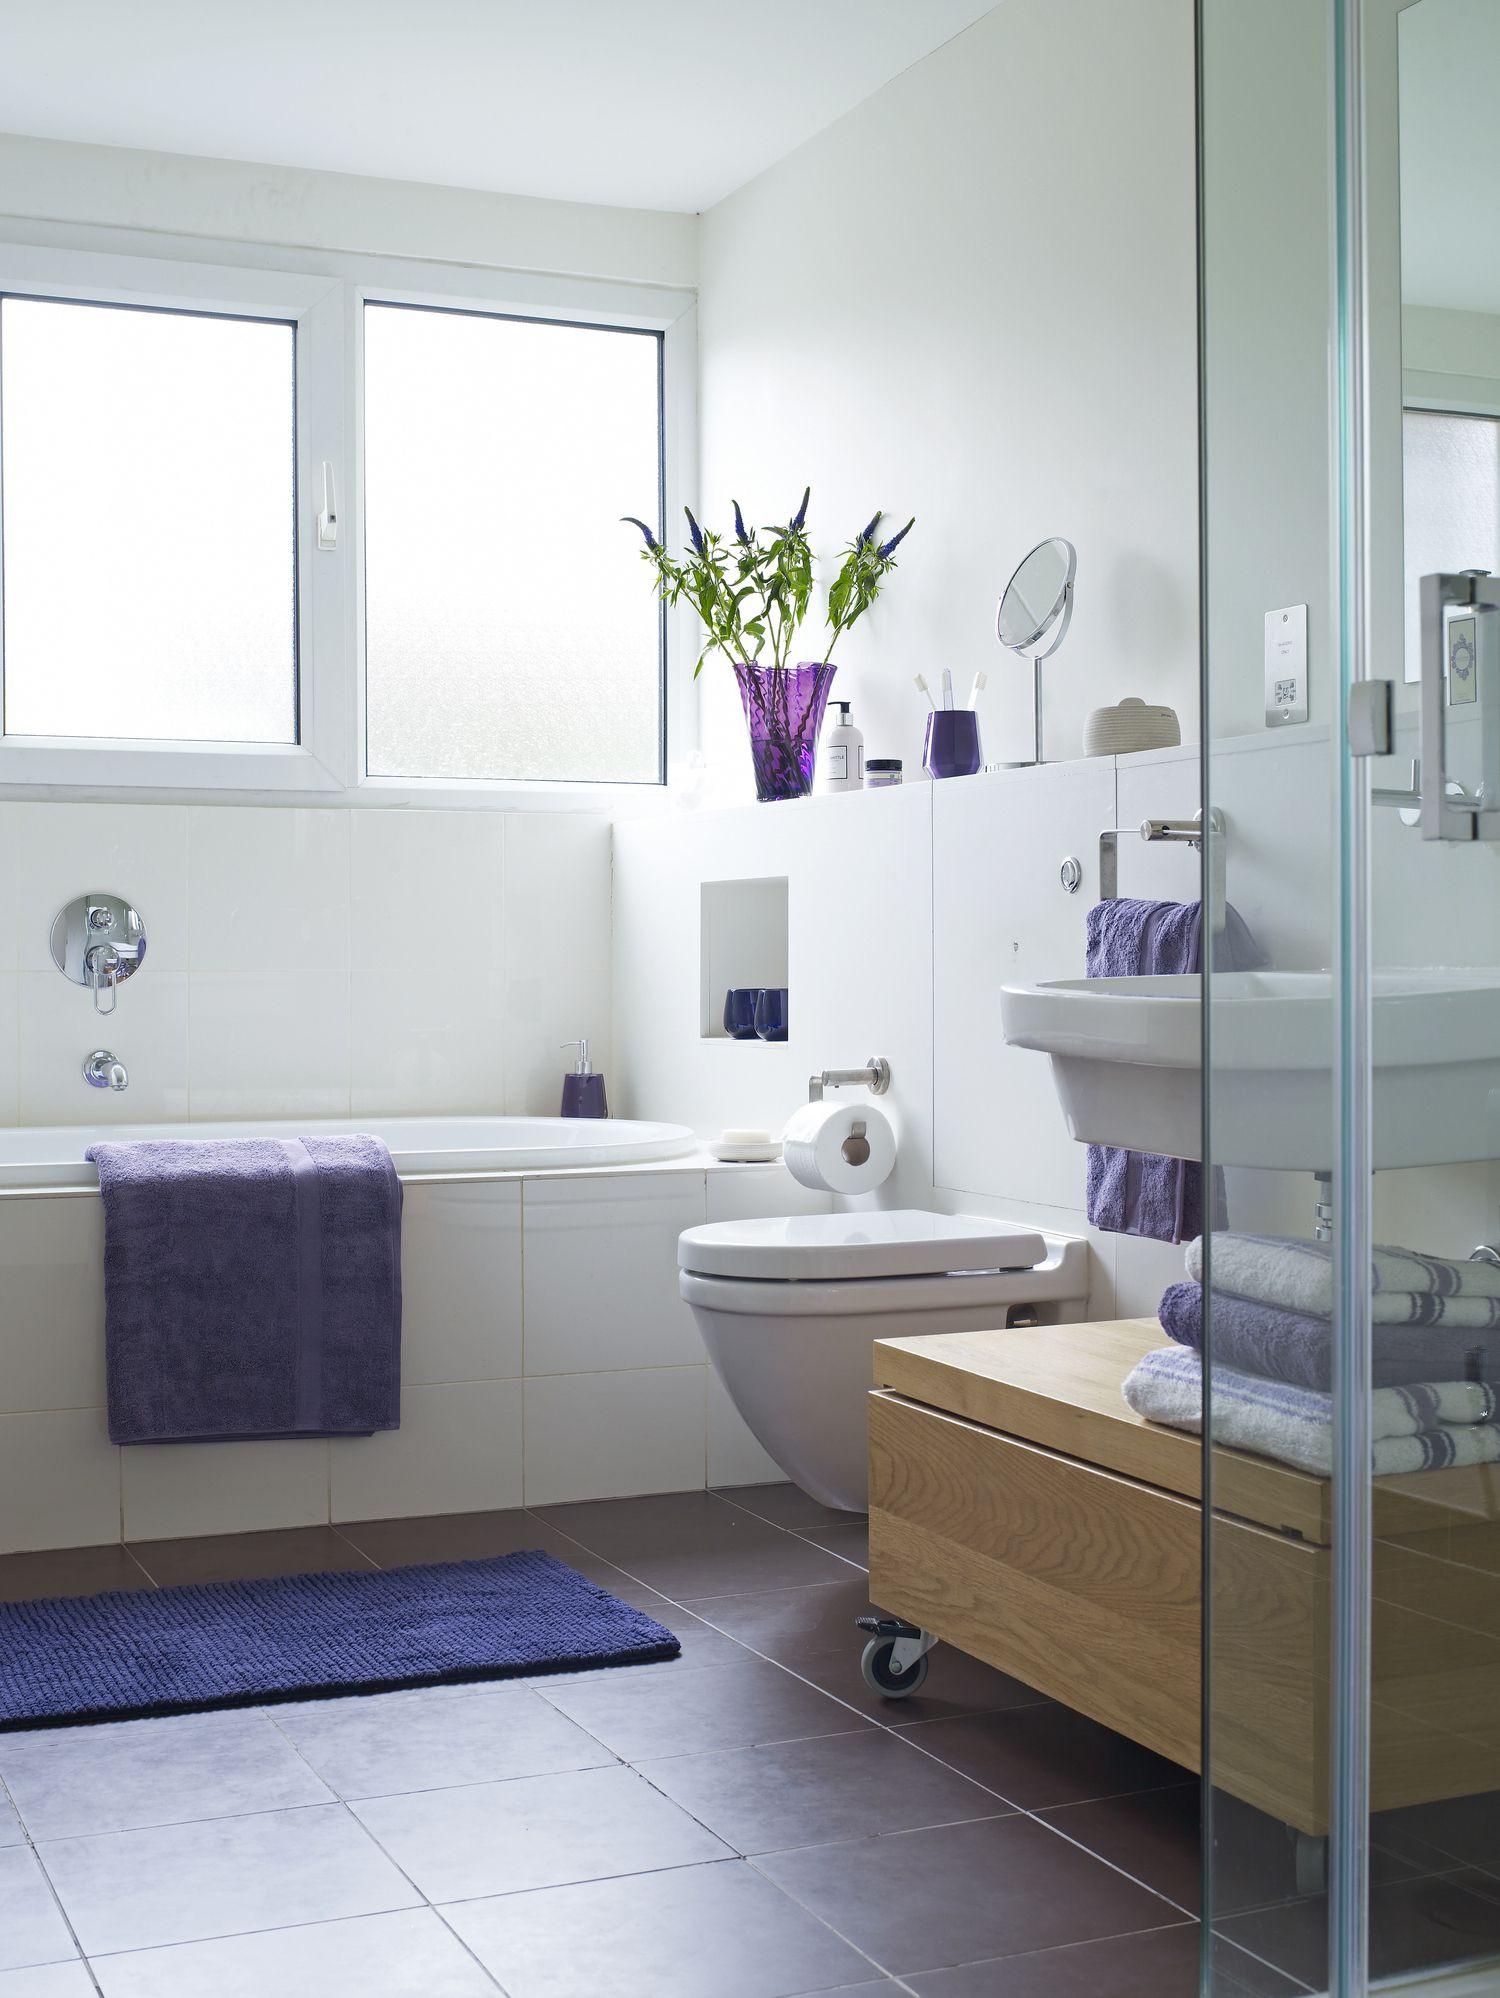 Bathroom Designs Small  25 Killer Small Bathroom Design Tips